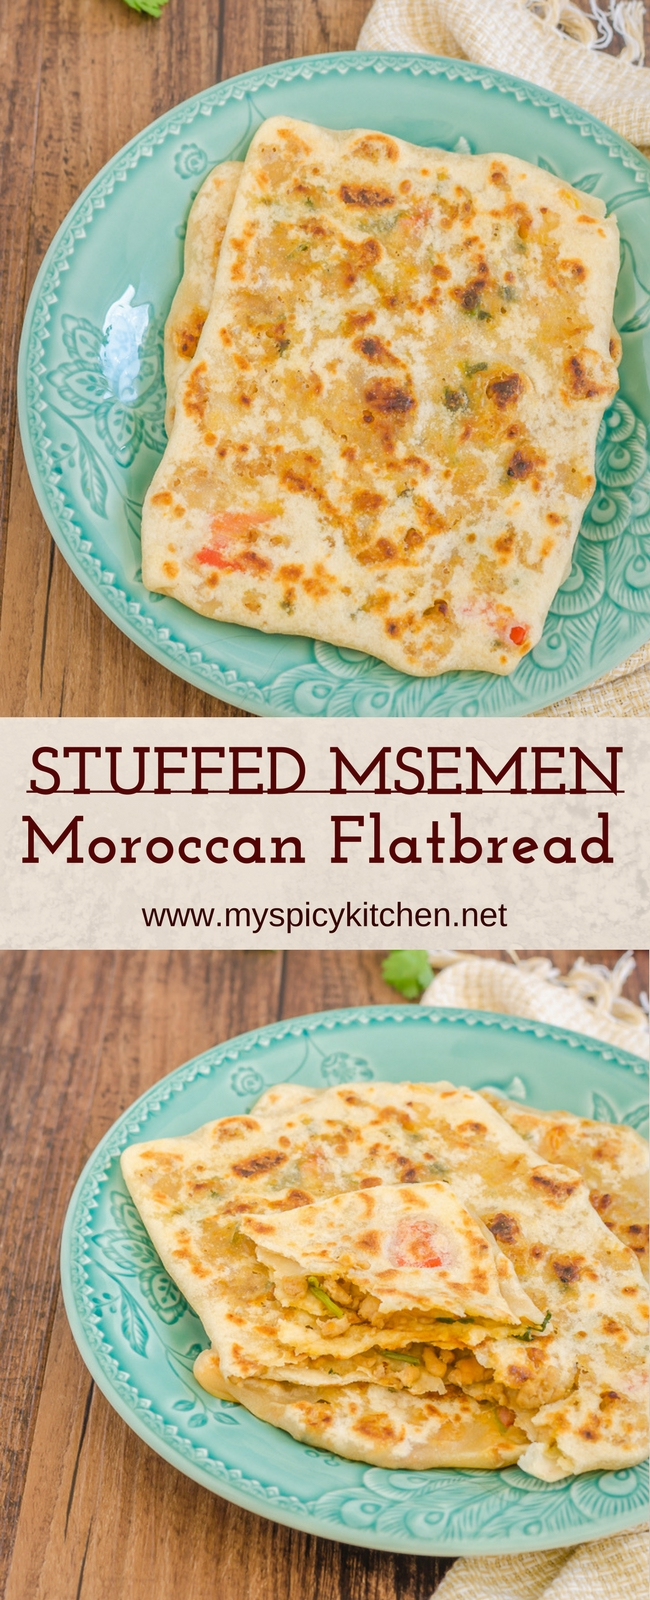 Stuffed Msemen Pinterest long pin